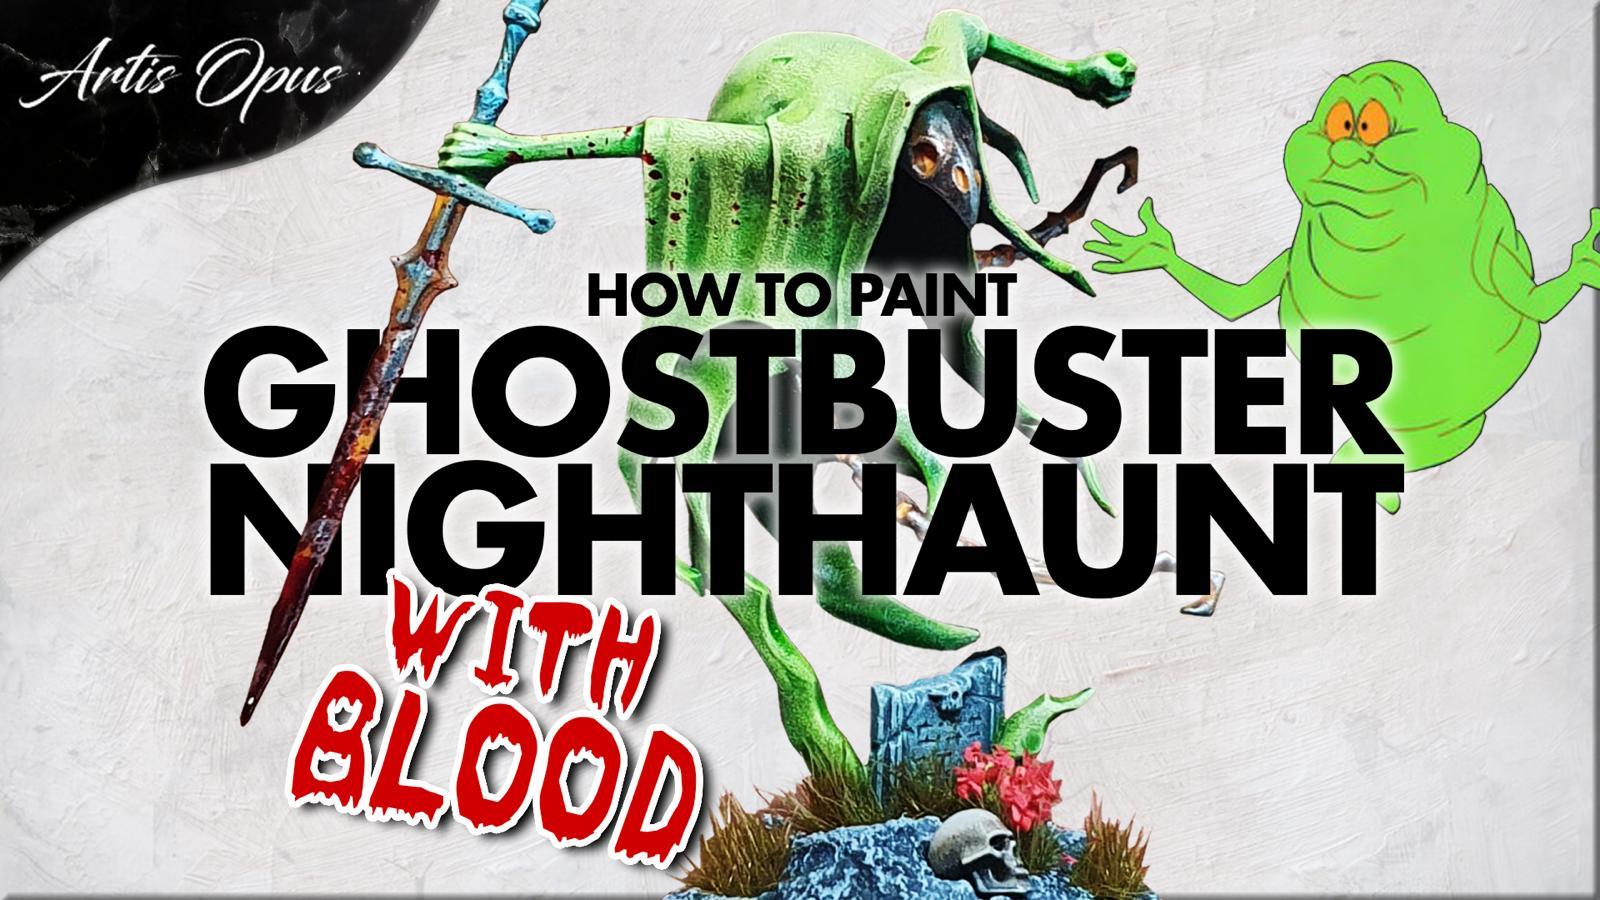 Artis Opus Ghostbuster Nighthaunt Paint Bundle